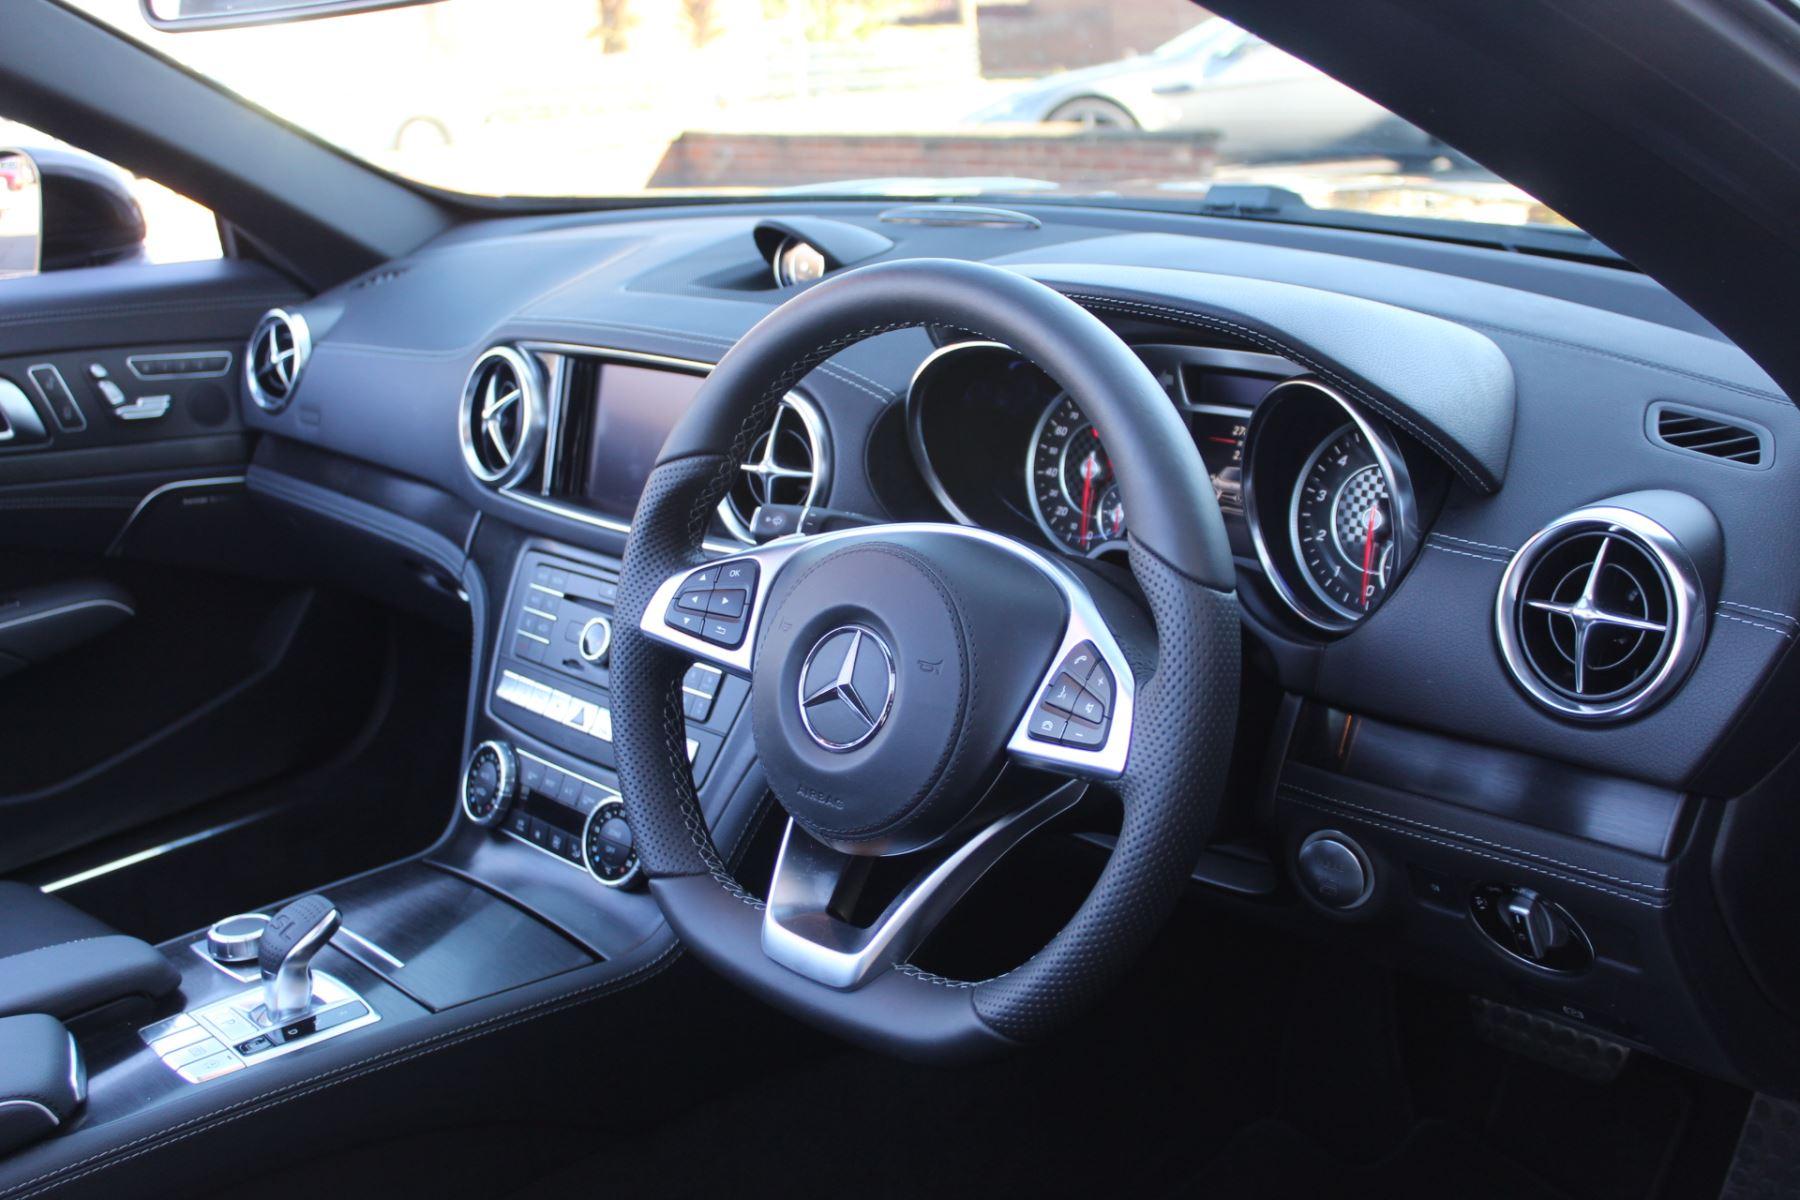 Mercedes-Benz SL SL 400 AMG Line Premium 2dr 9G-Tronic image 15